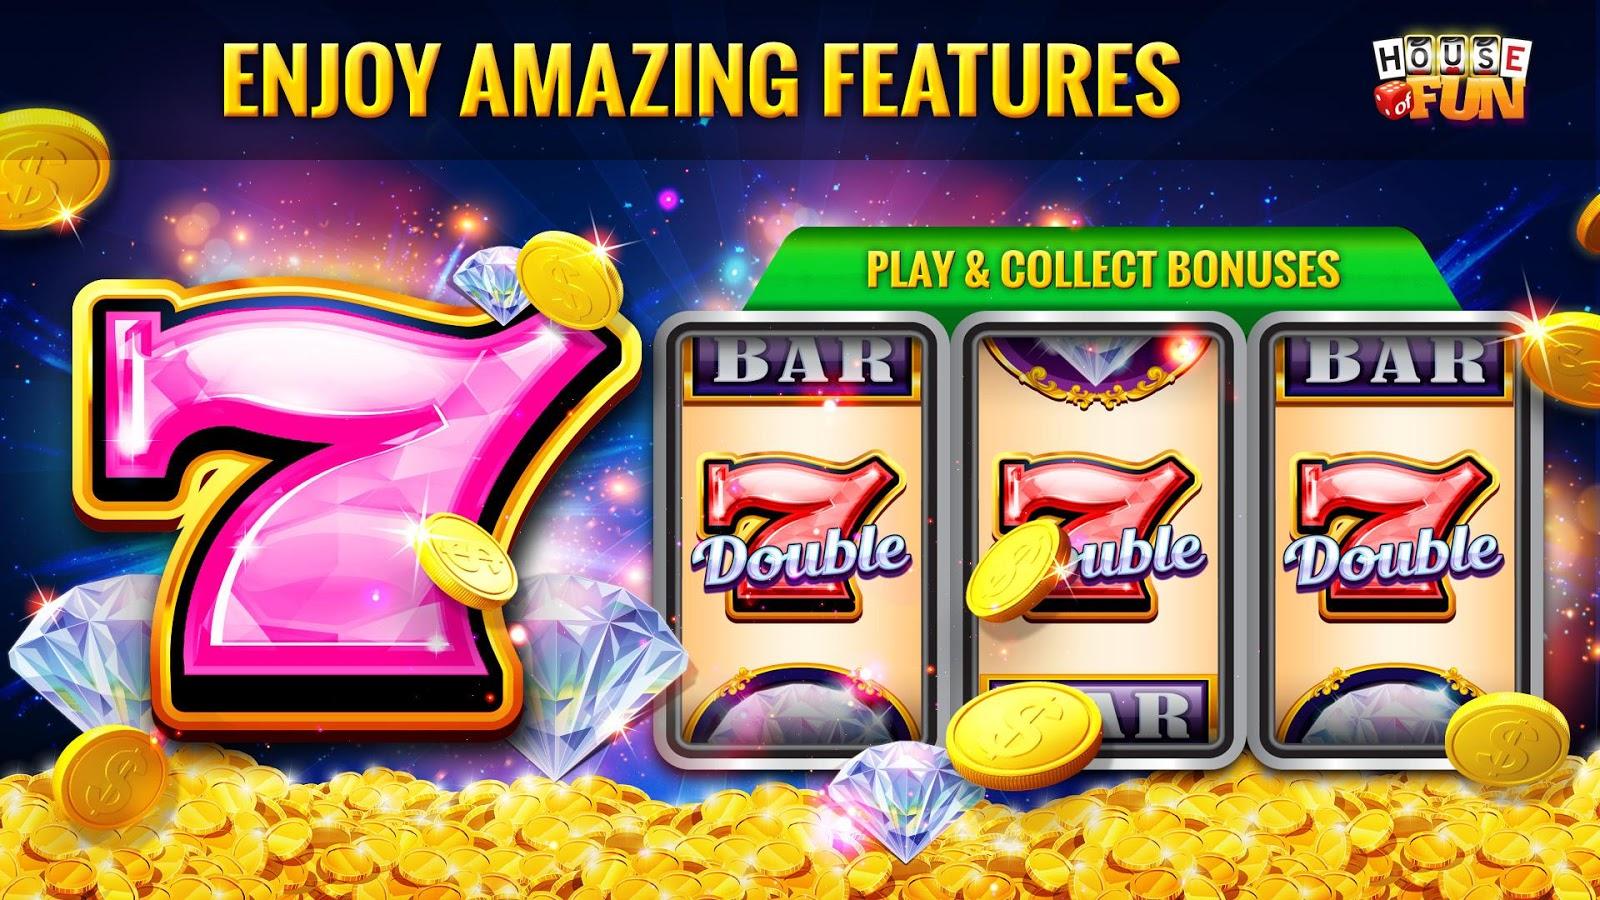 slots-house of fun-free casino